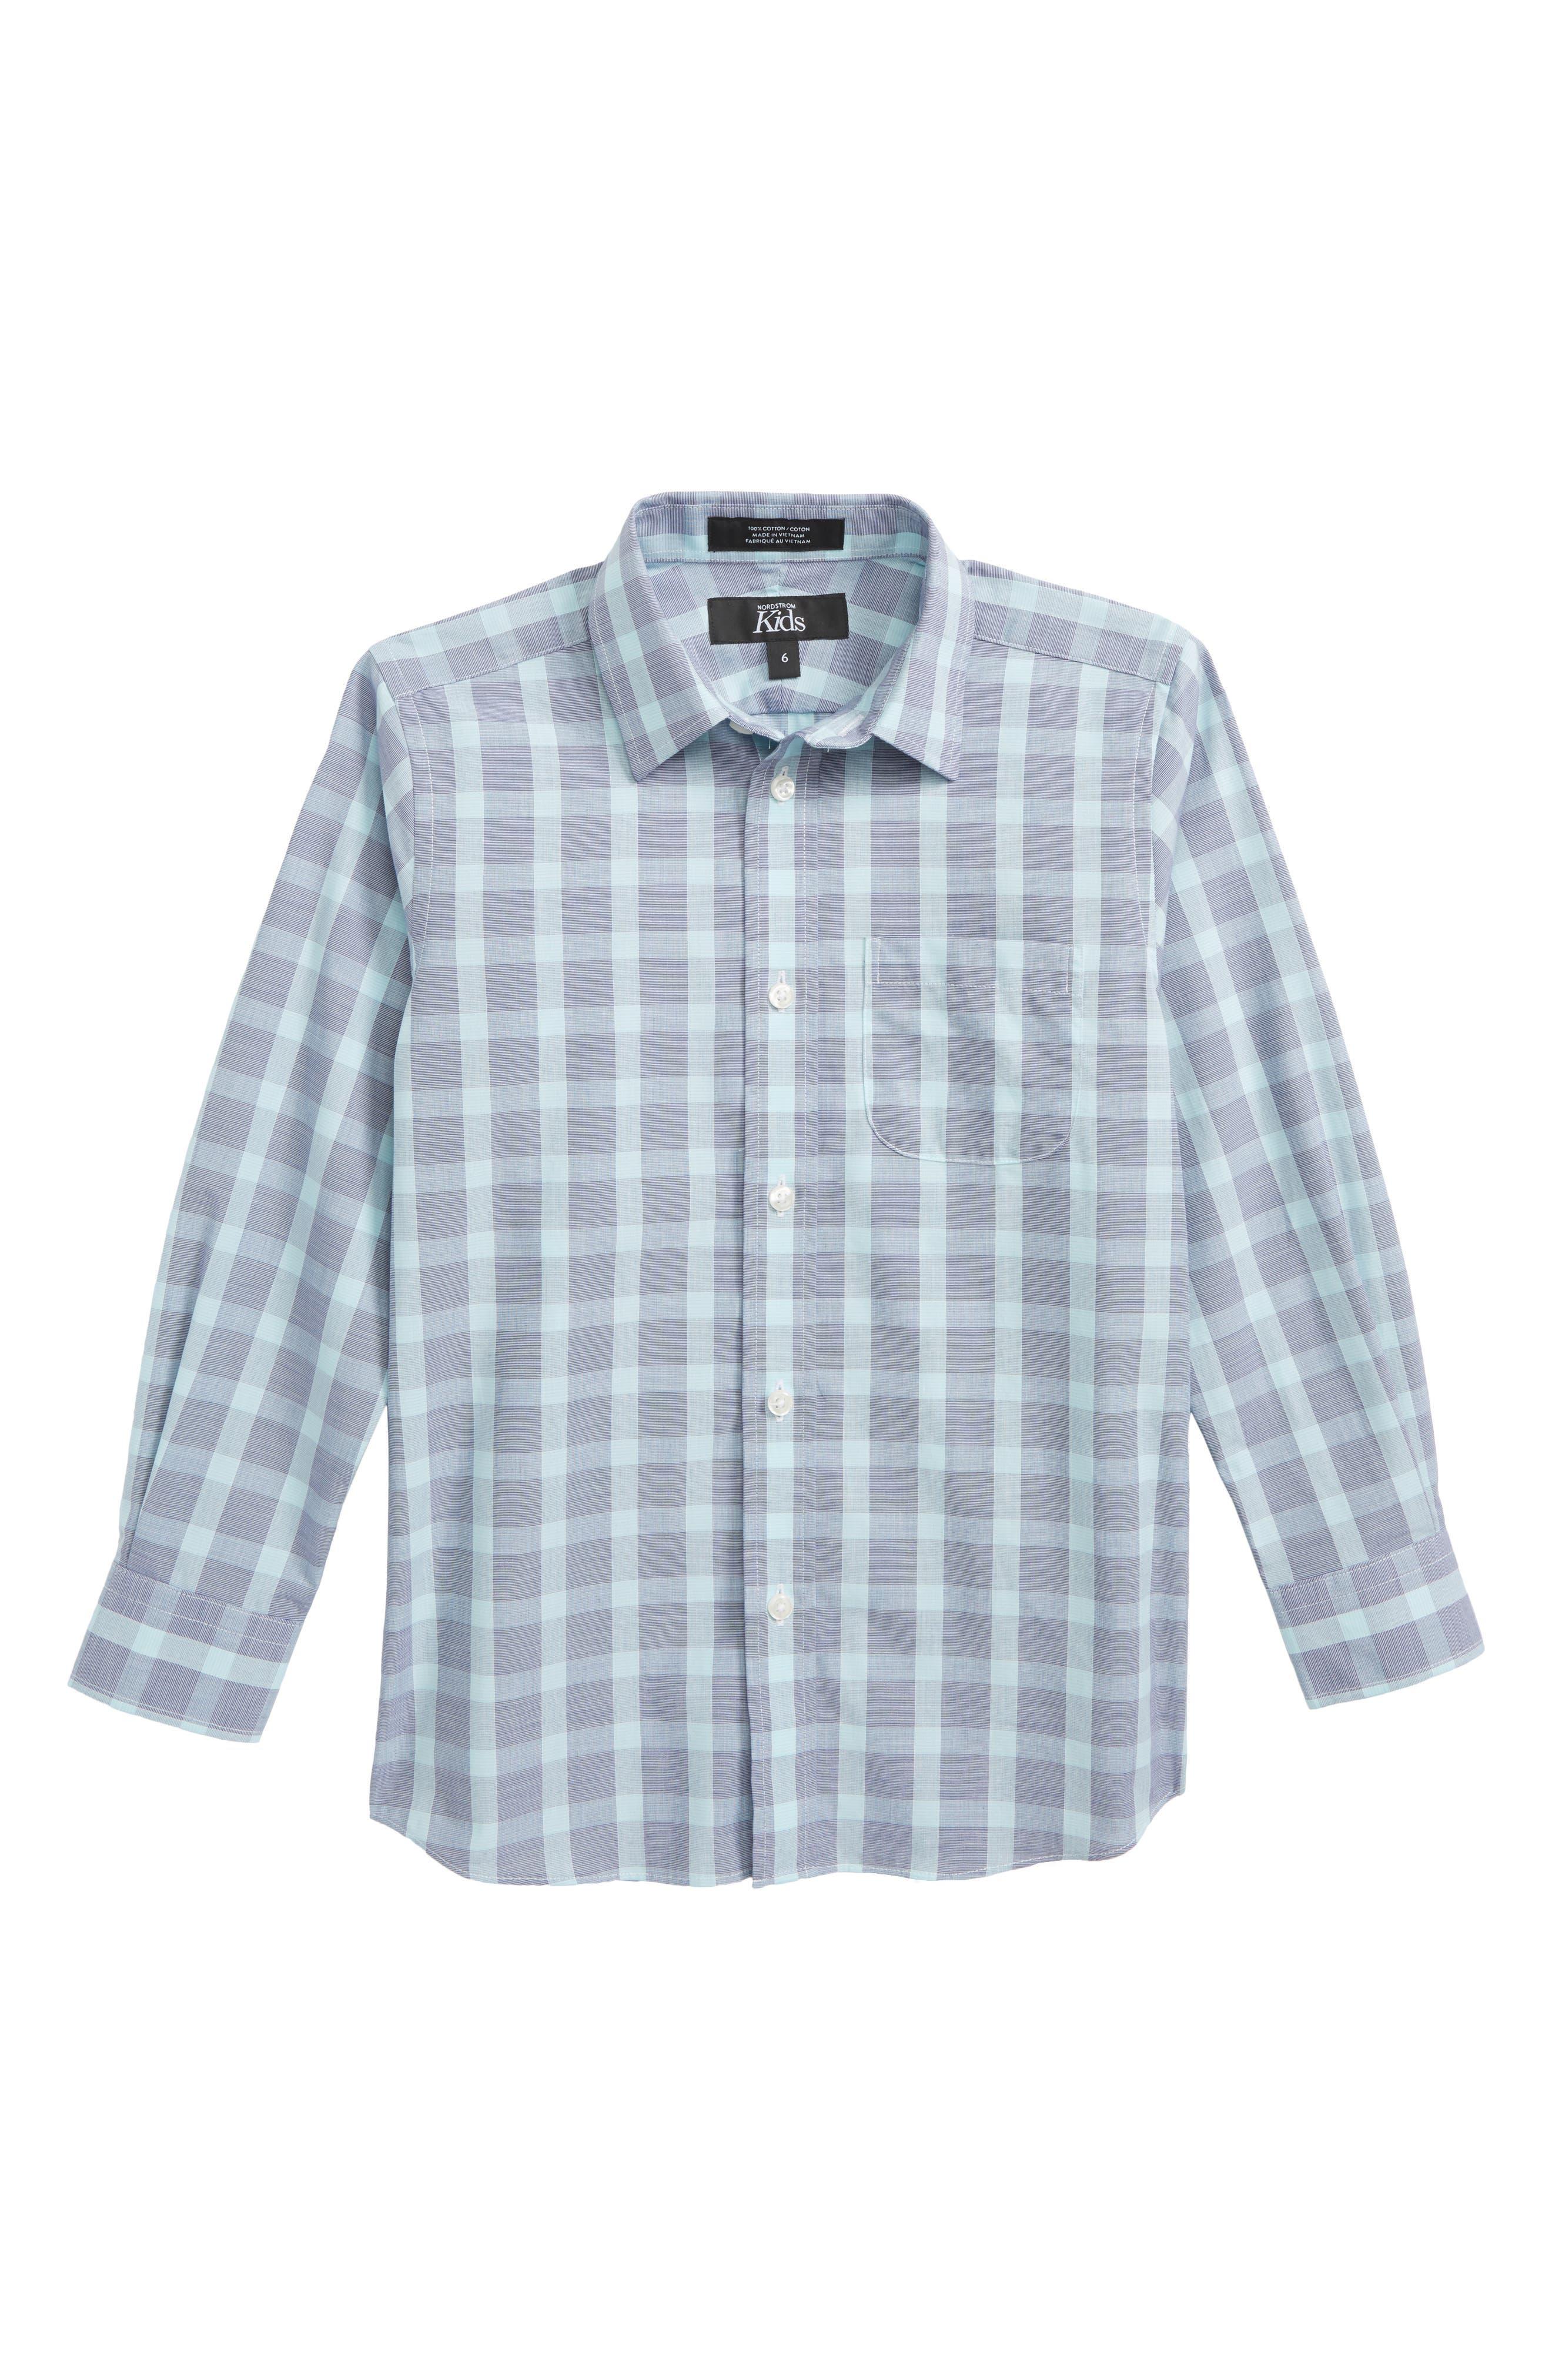 Plaid Dress Shirt,                             Main thumbnail 1, color,                             Navy Ribbon- Teal Plaid